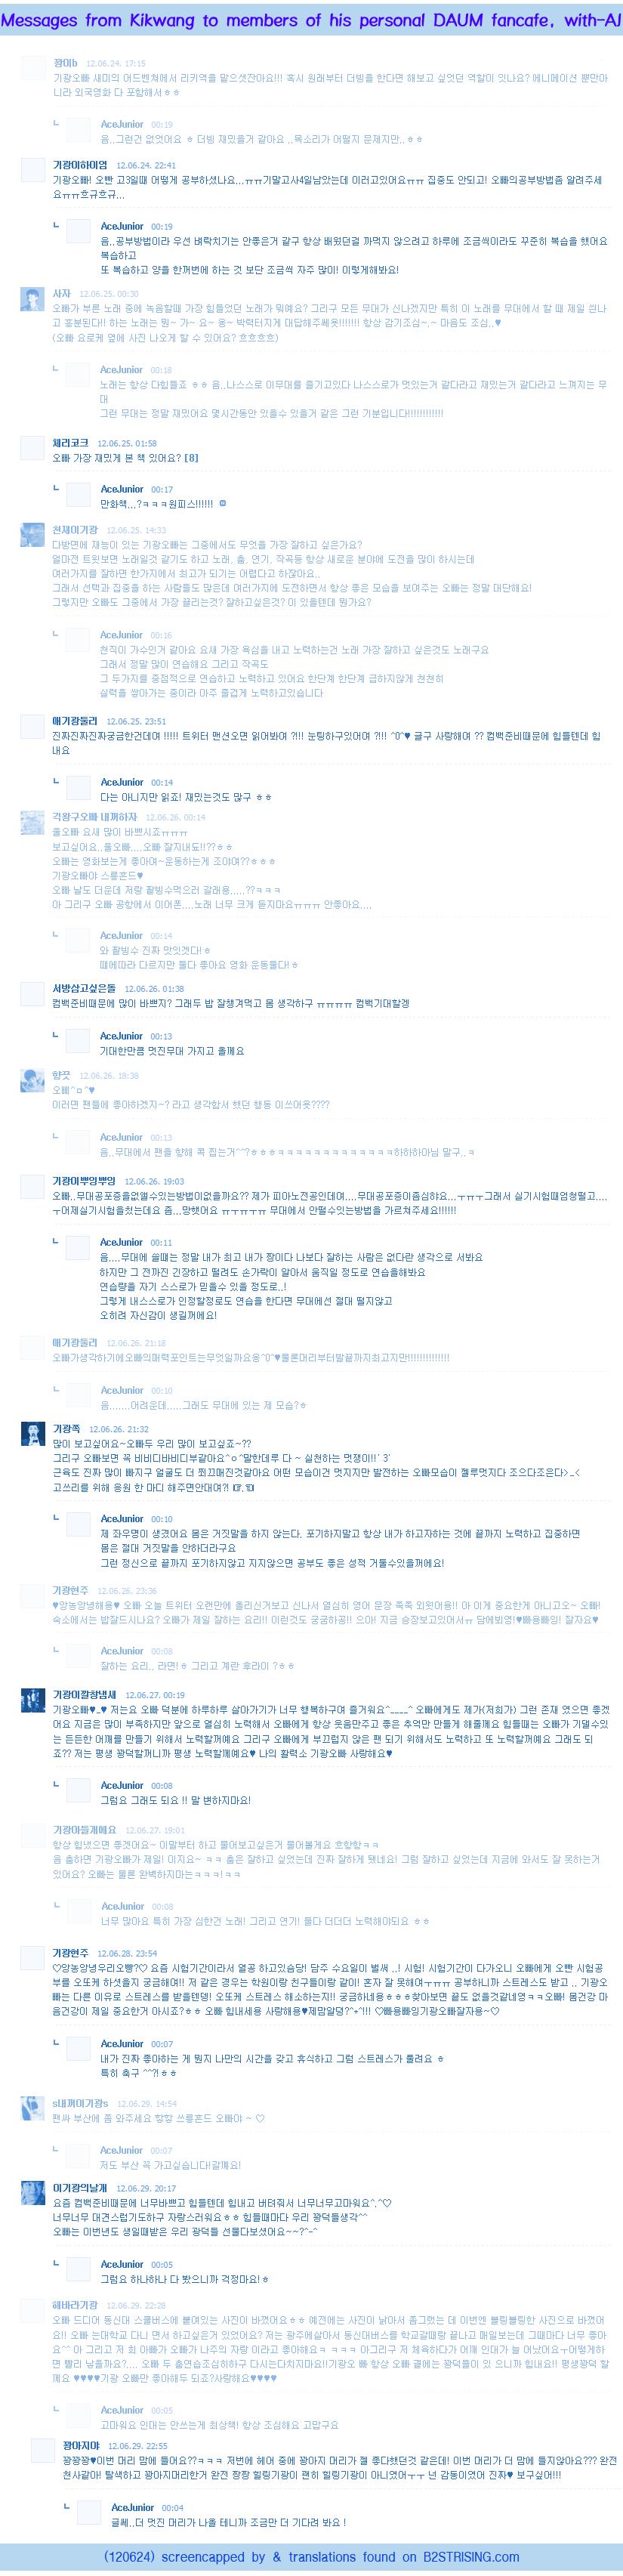 [24.06.12] Mensajes de Kikwang en su cuenta personal del fancafe Kikwangmessages